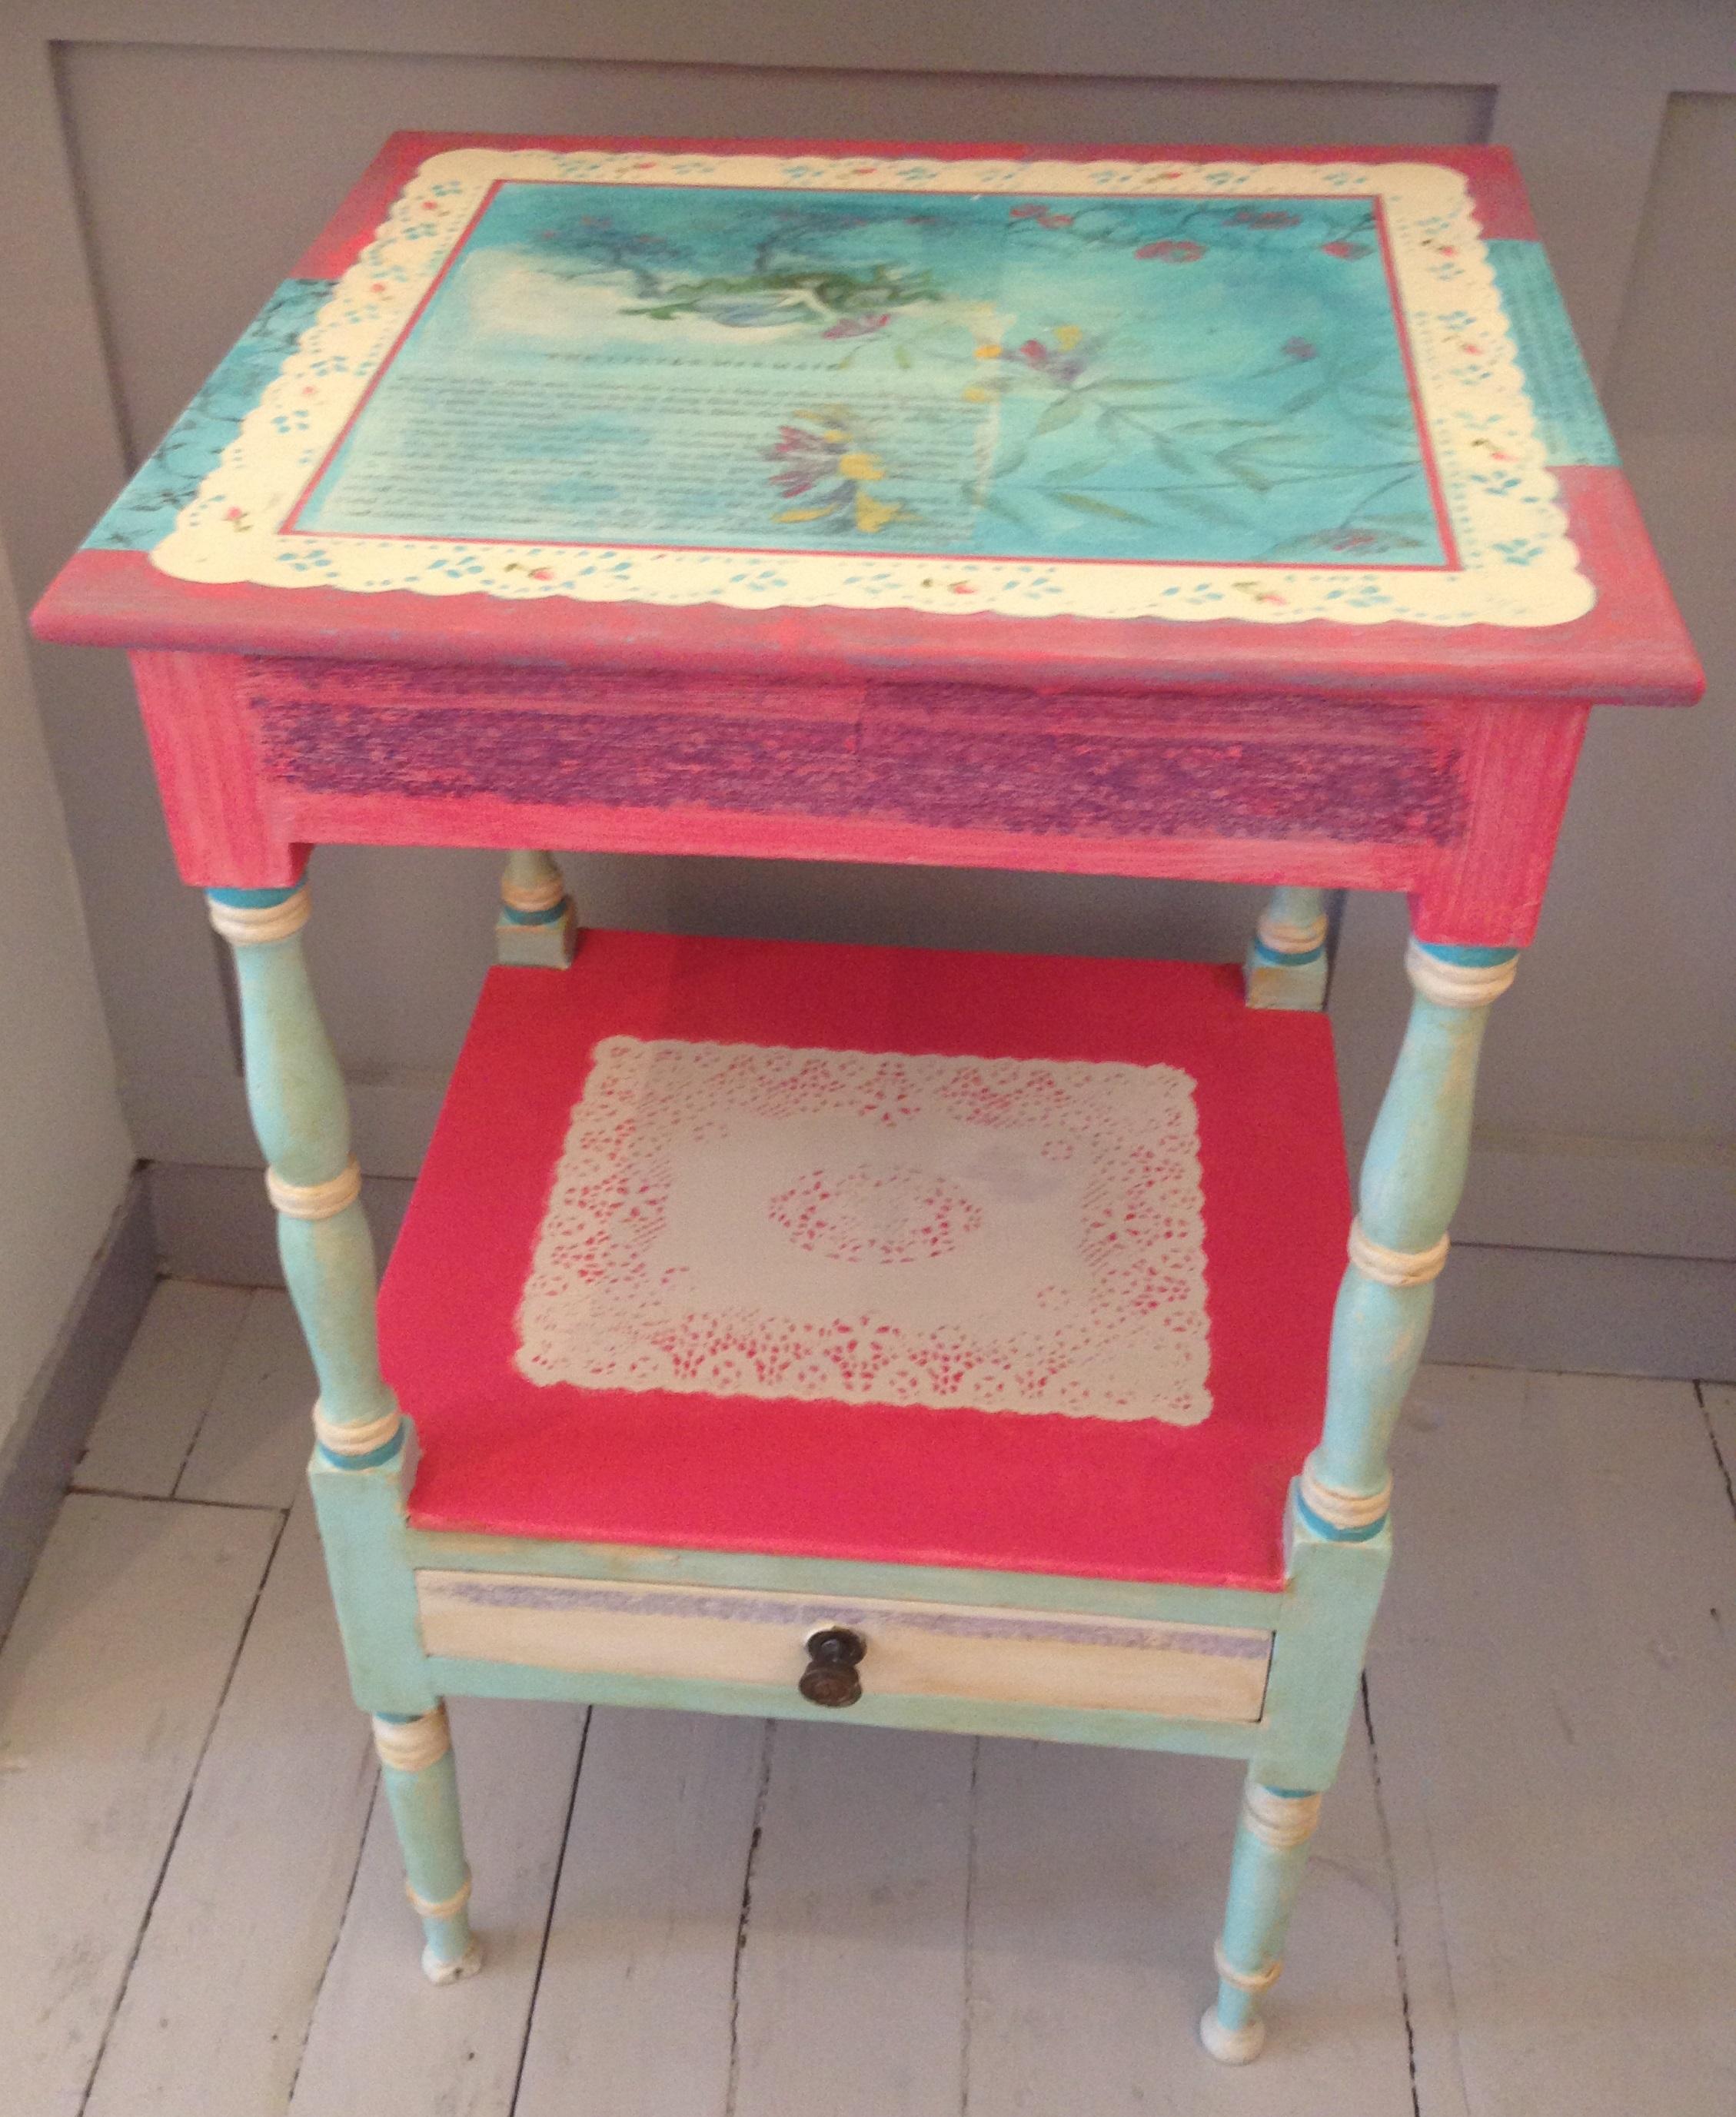 'Little Mermaid' Table.jpg